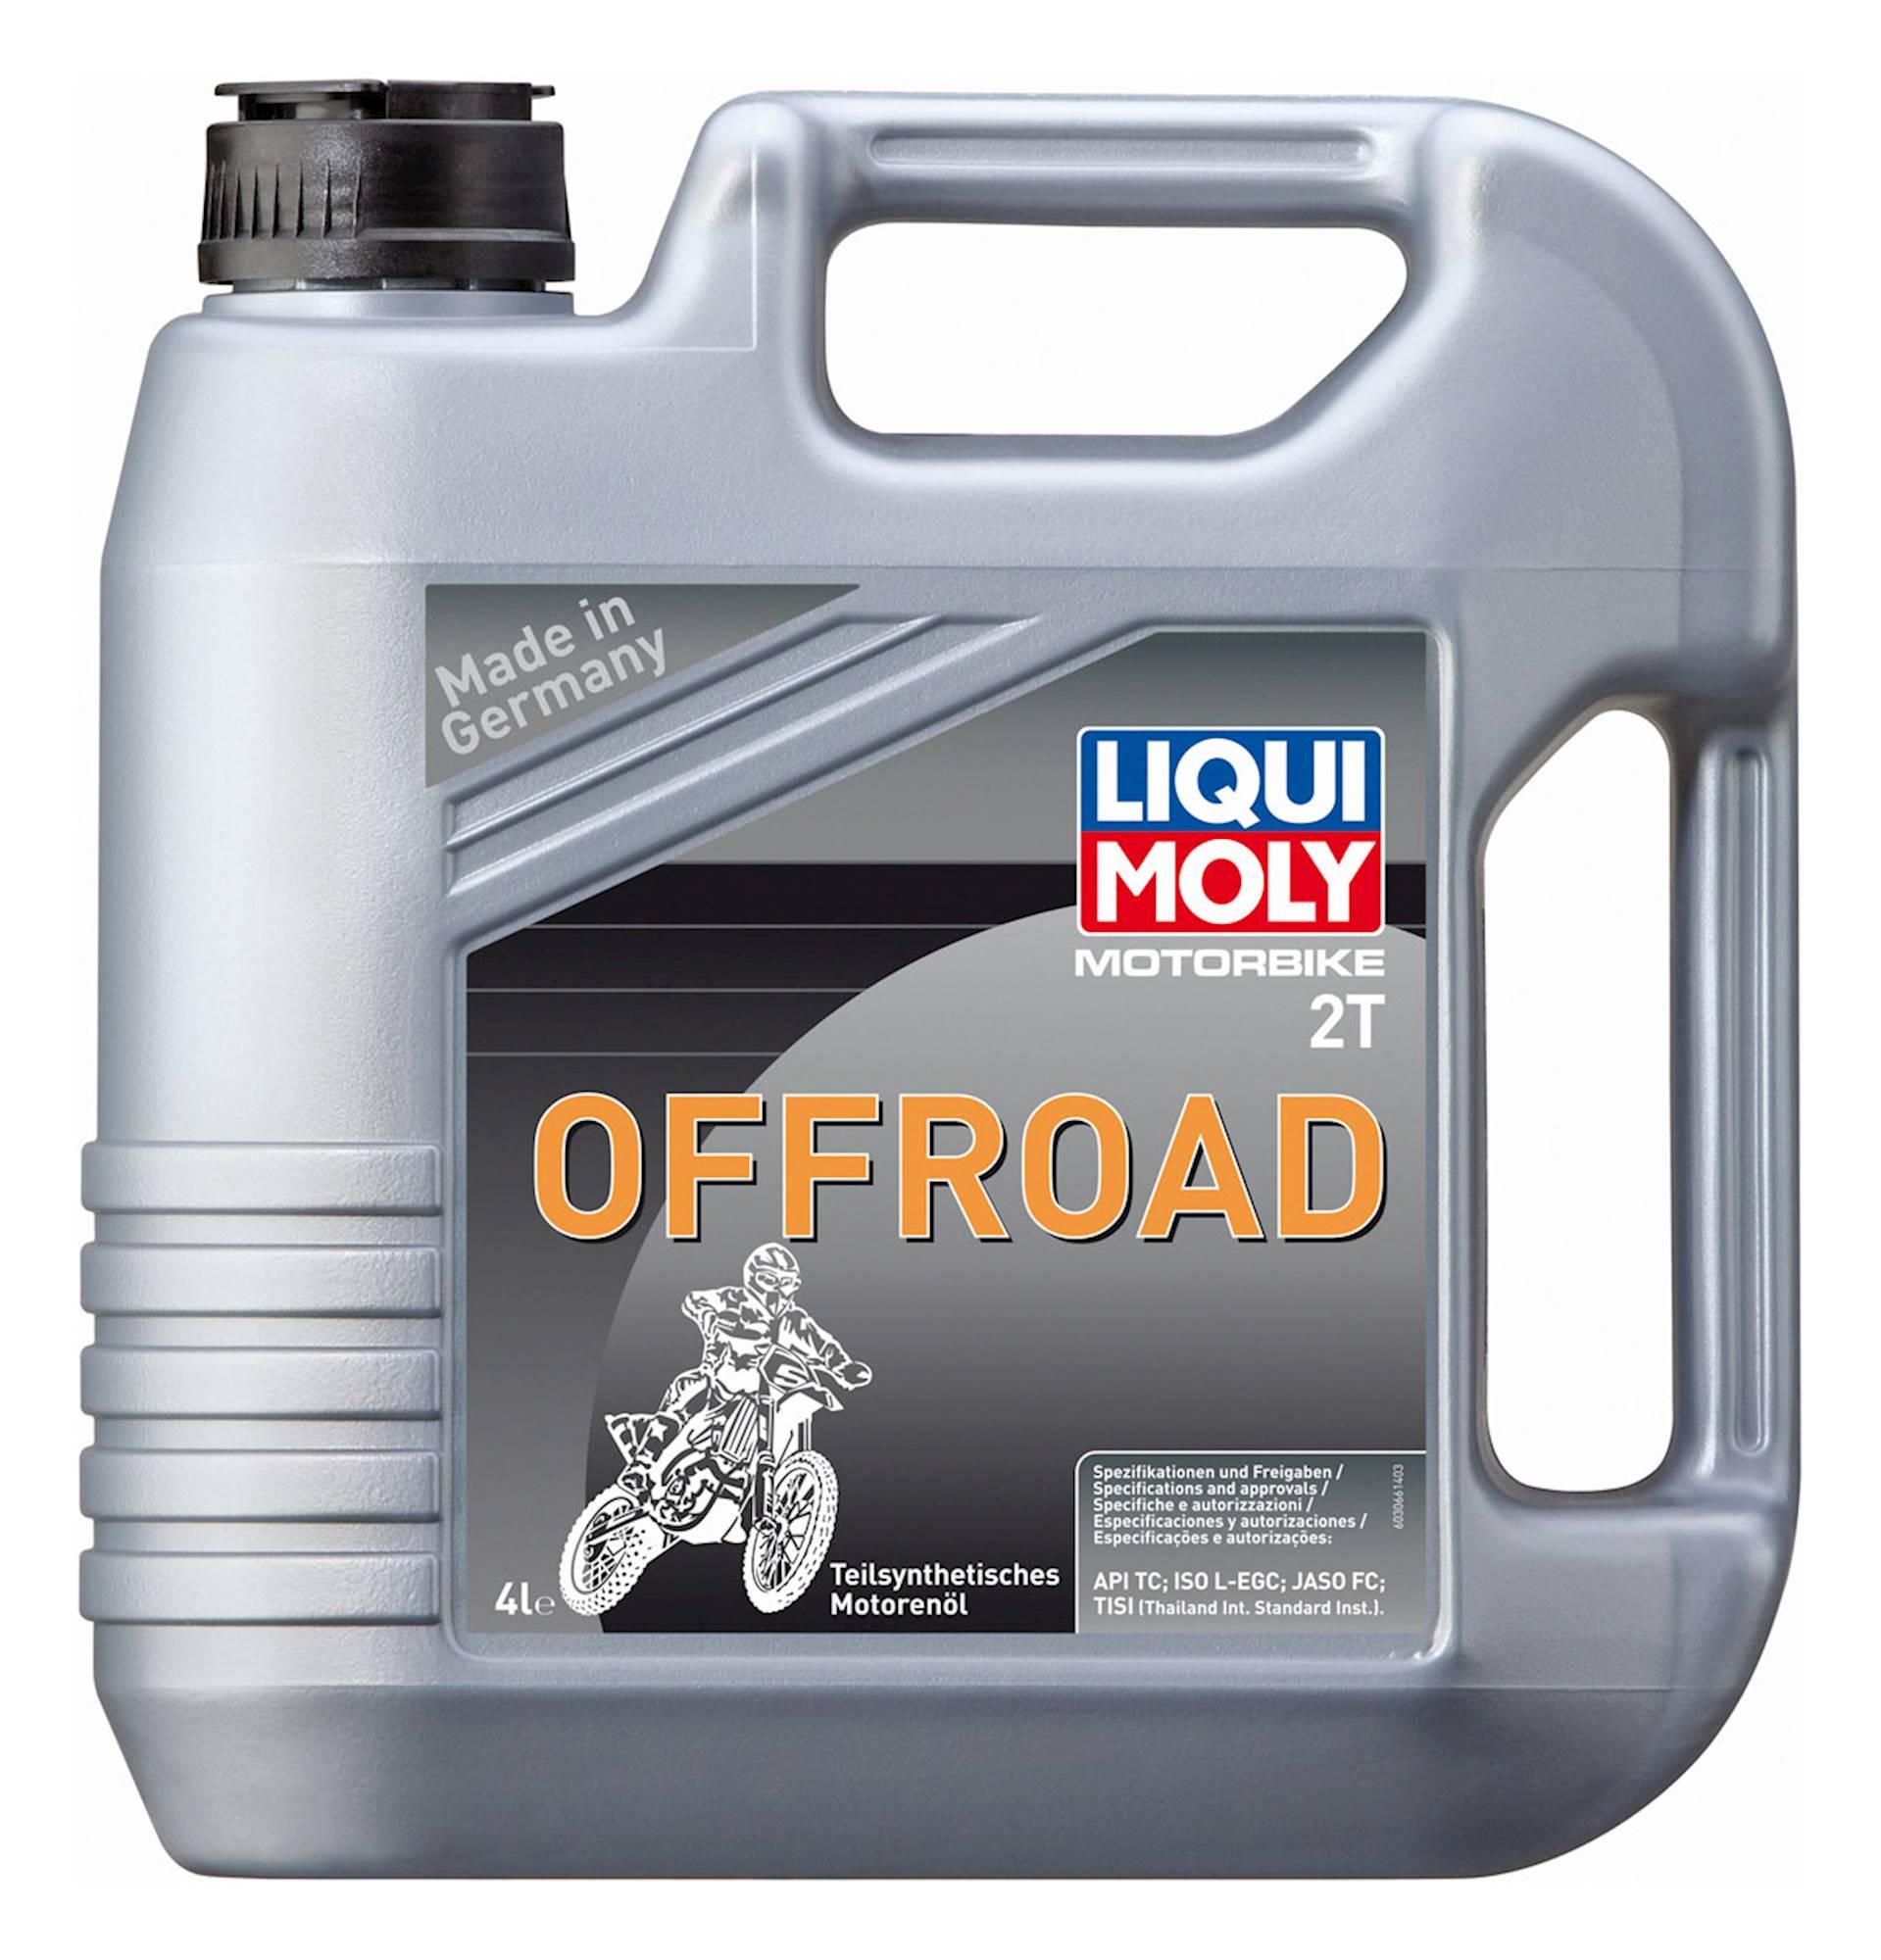 Liqui Moly 2 Stroke Semi Synthetic Offroad 4L - #3066